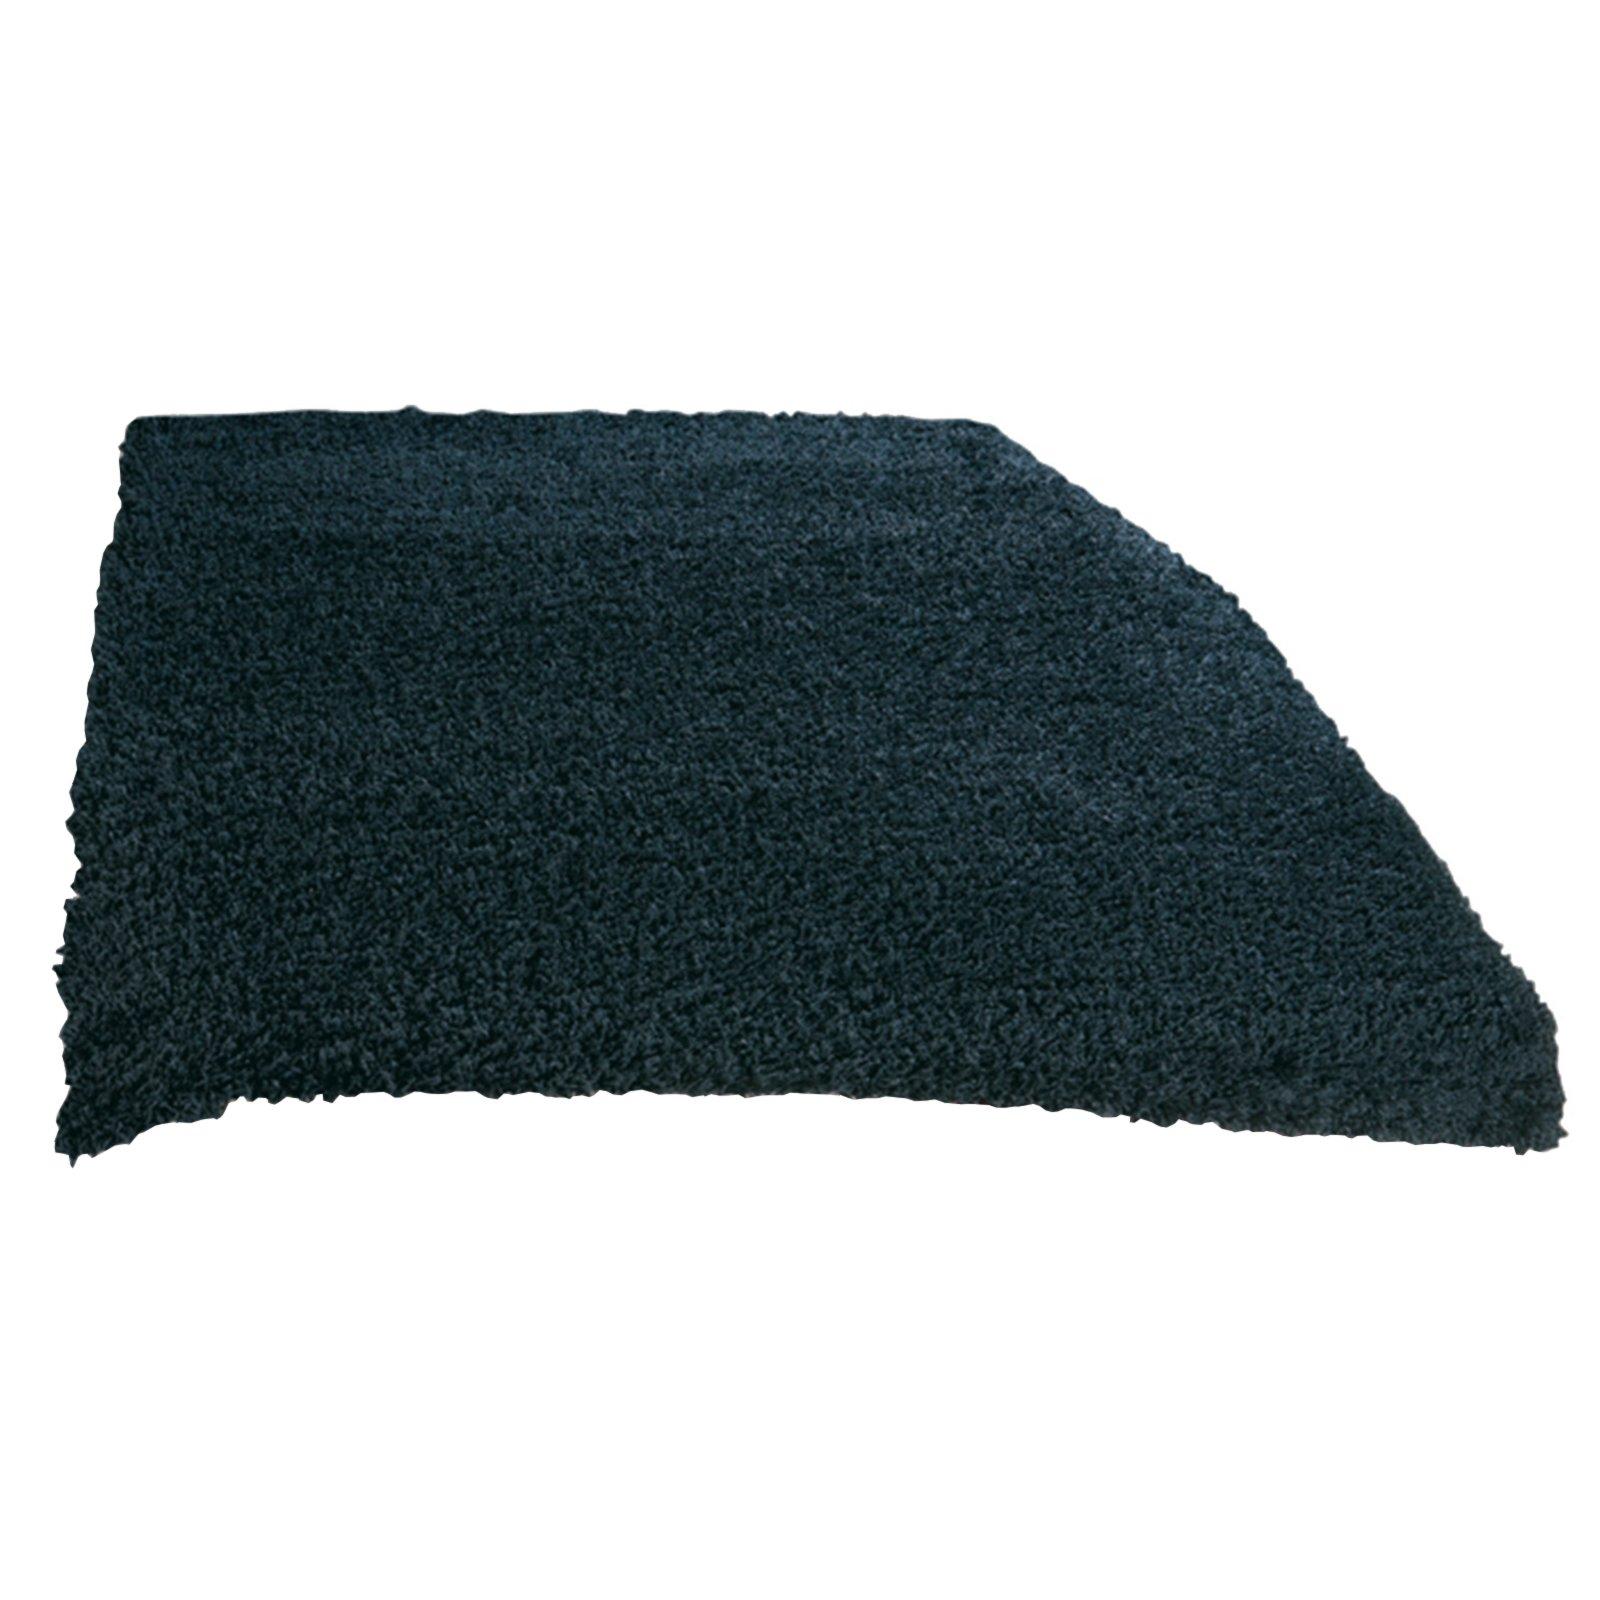 teppich shaggy schwarz 40x60 cm hochflor. Black Bedroom Furniture Sets. Home Design Ideas